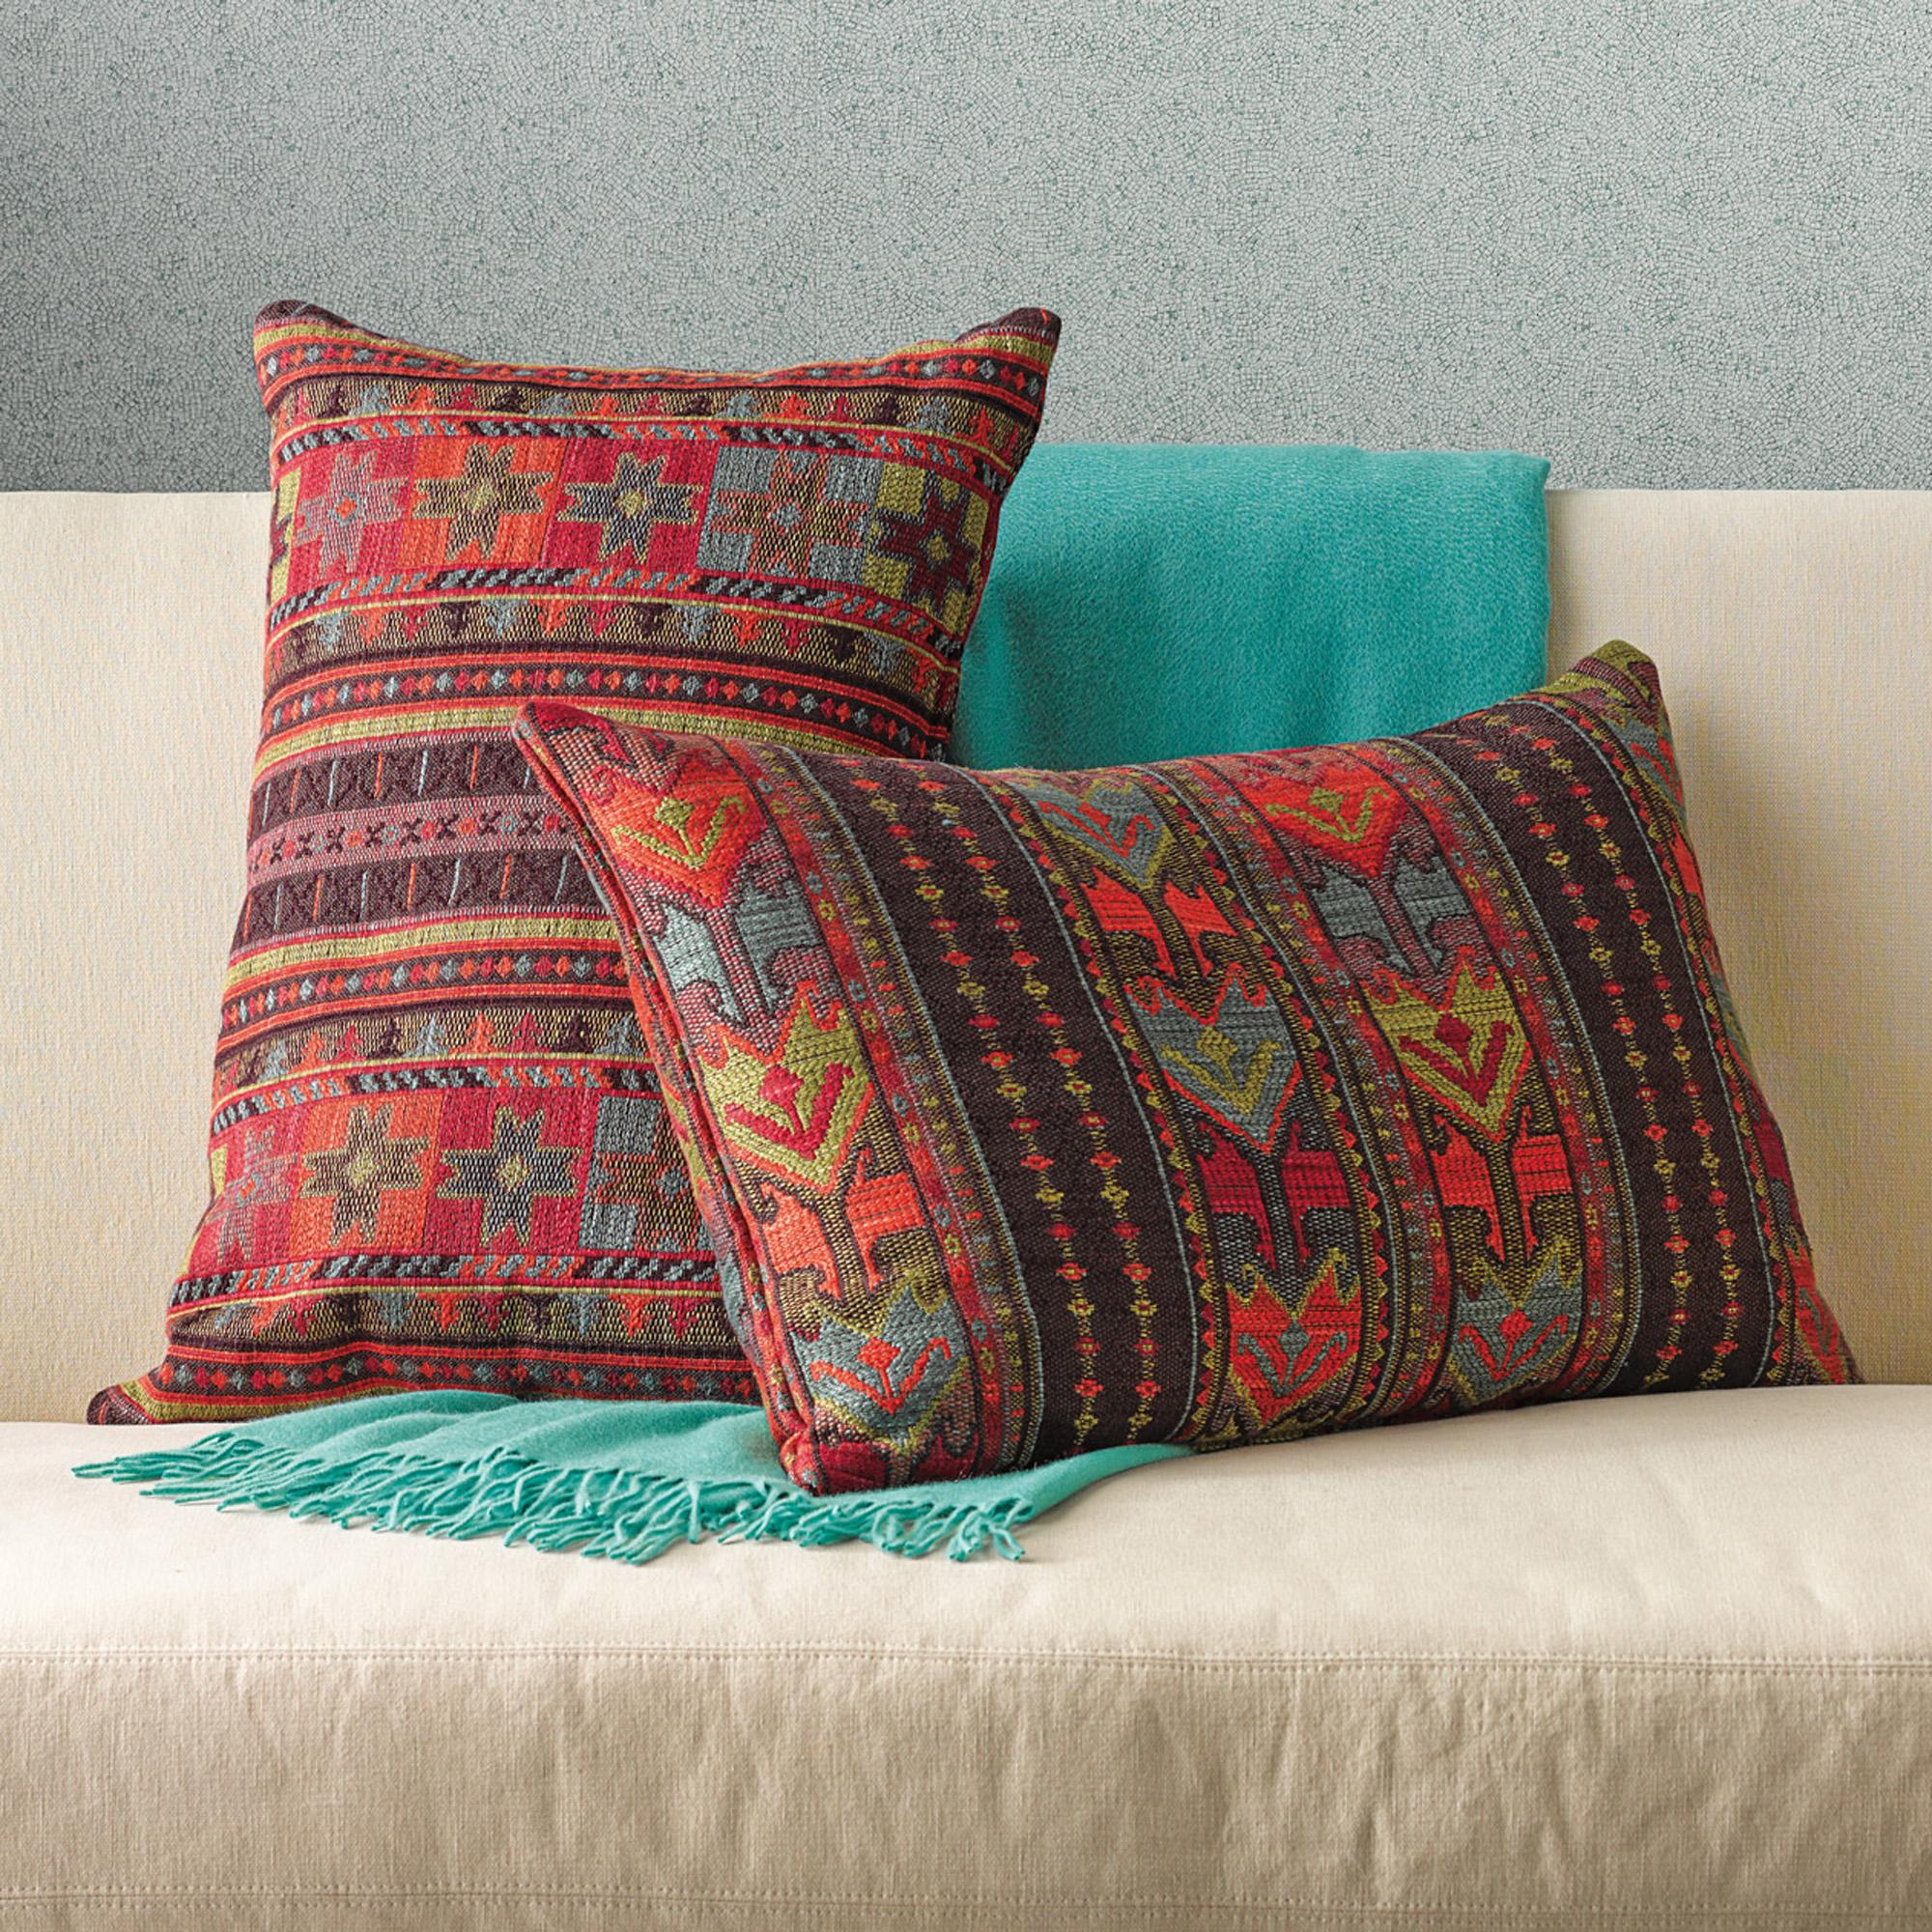 Throw Pillows Home : Tribal Pillows Gump s